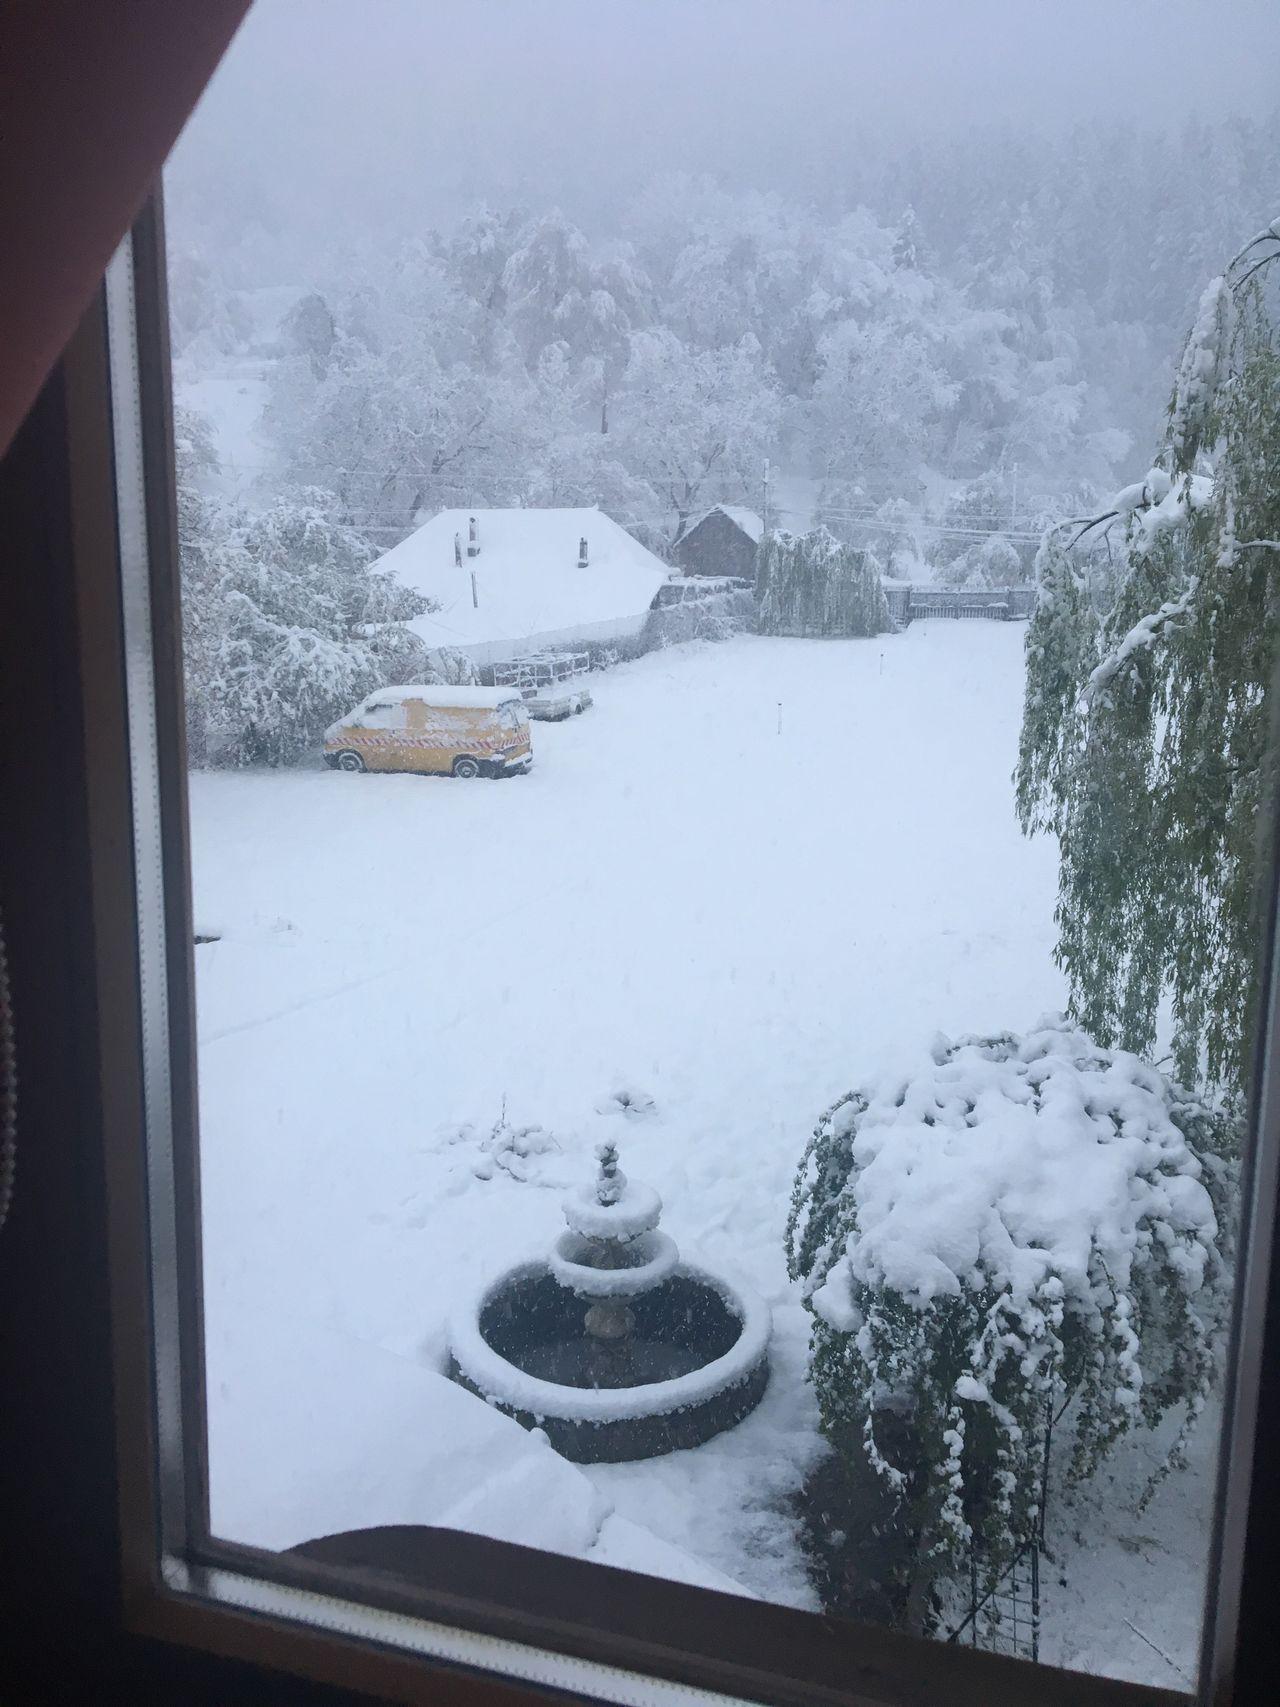 Winter Snow ❄ Countryside Winter Landscape Cold Temperature Late Winter